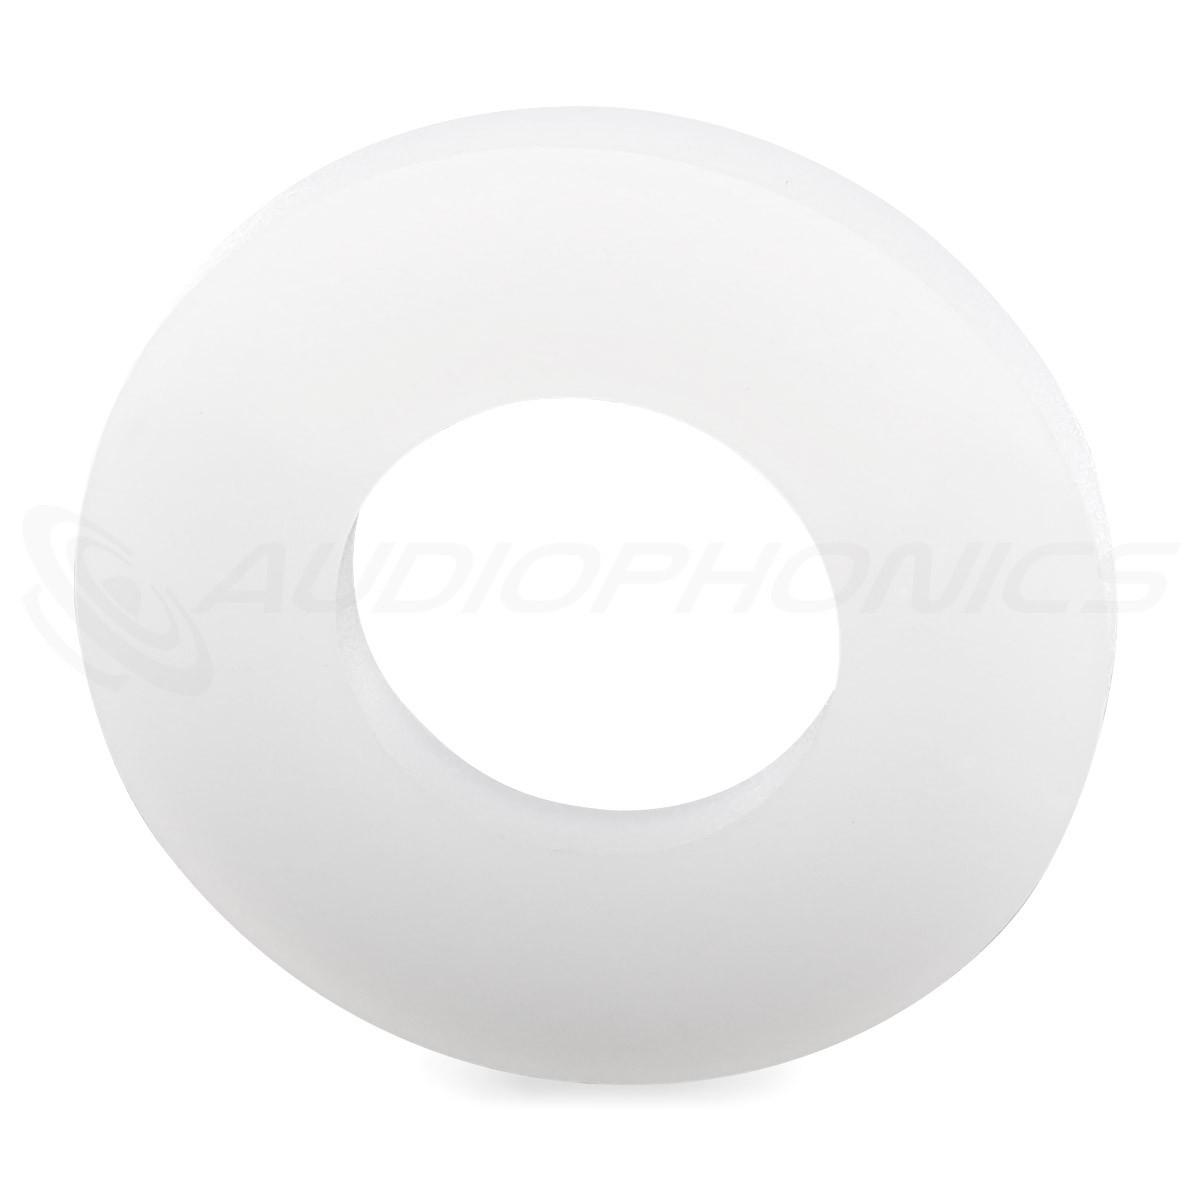 Rondelle Plate Nylon M10x2.5mm (x10)